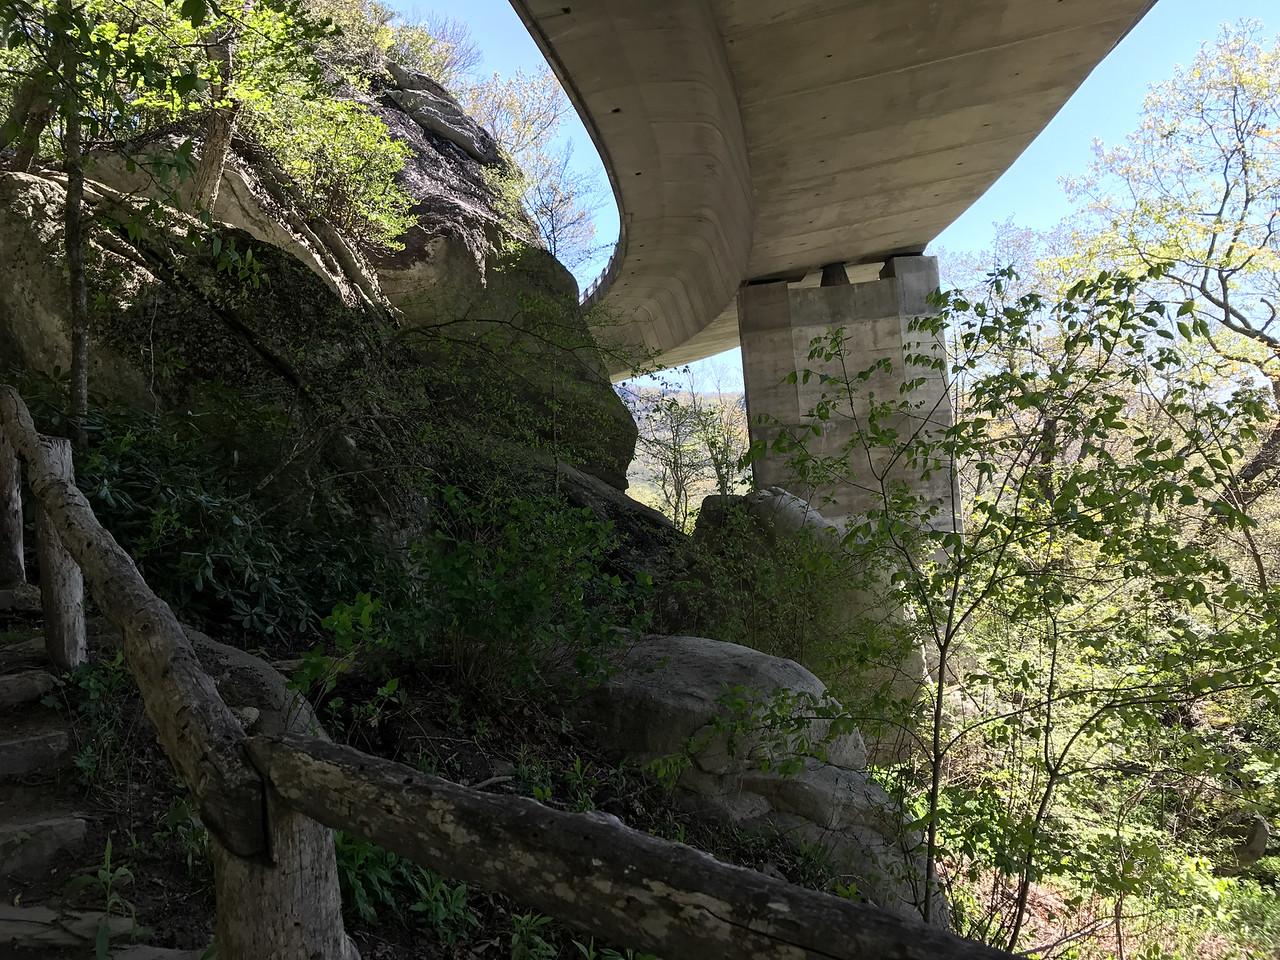 Beneath the Viaduct